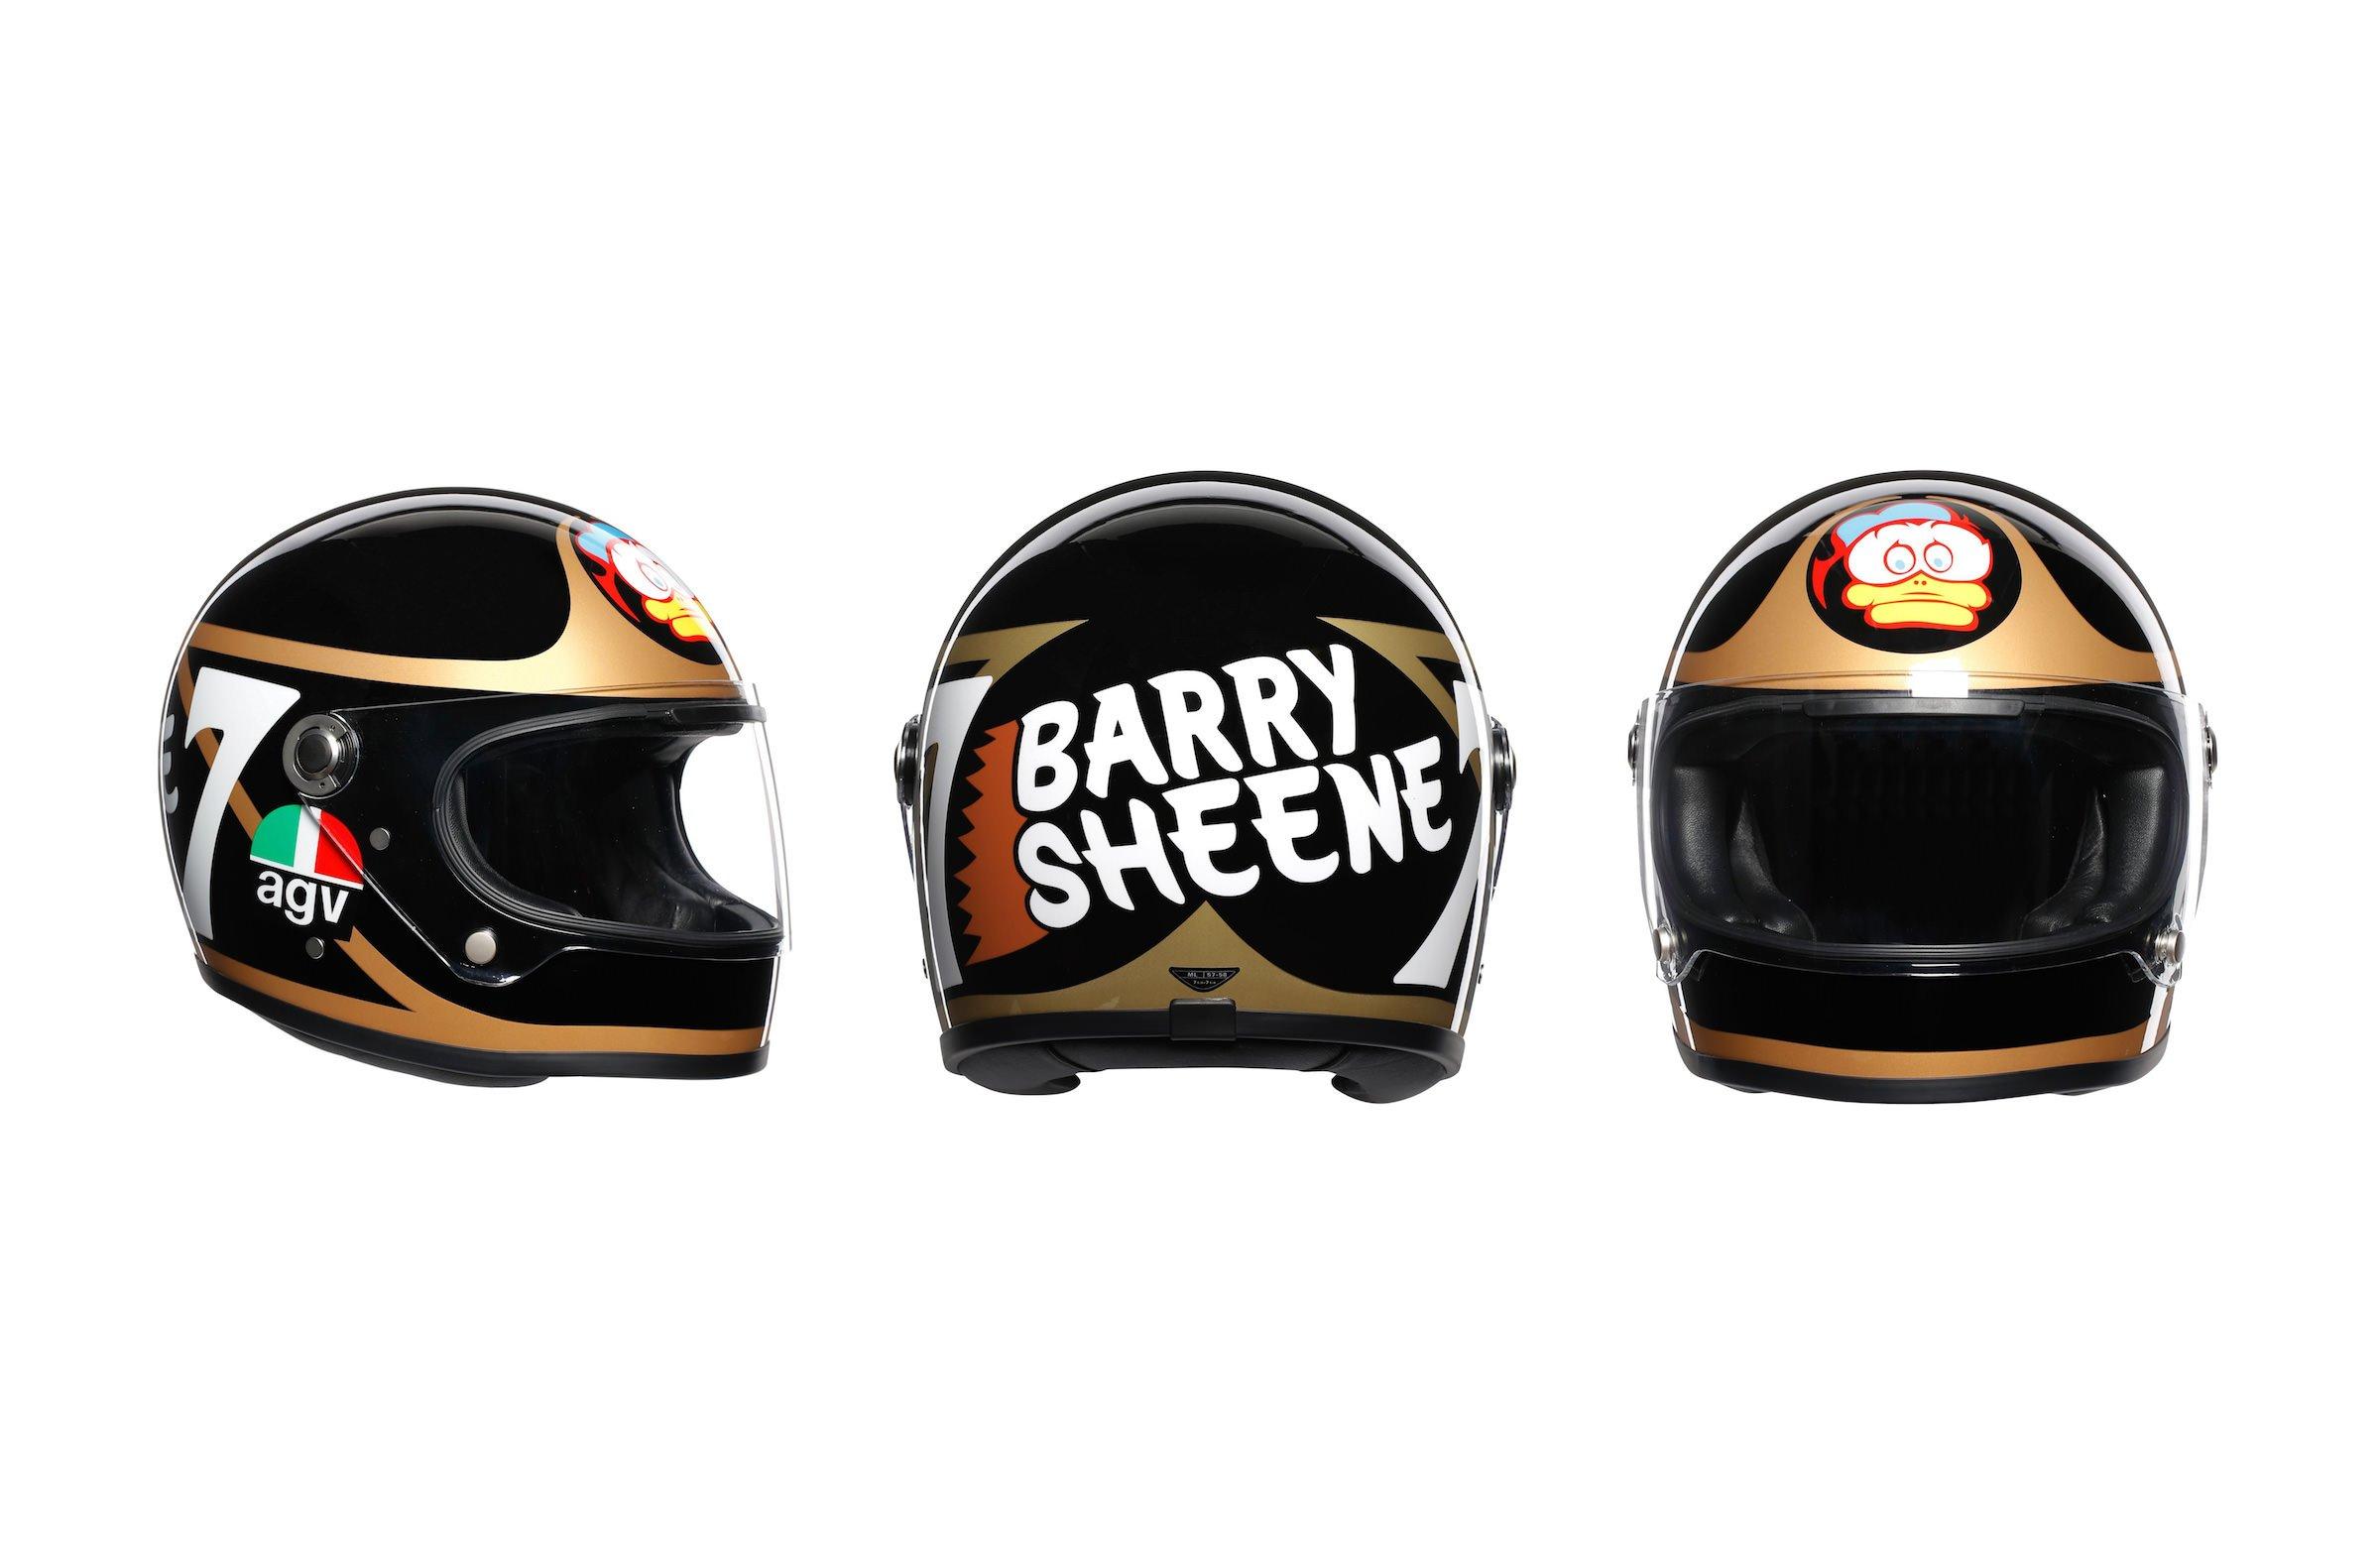 AGV X3000 Barry Sheene Helmets